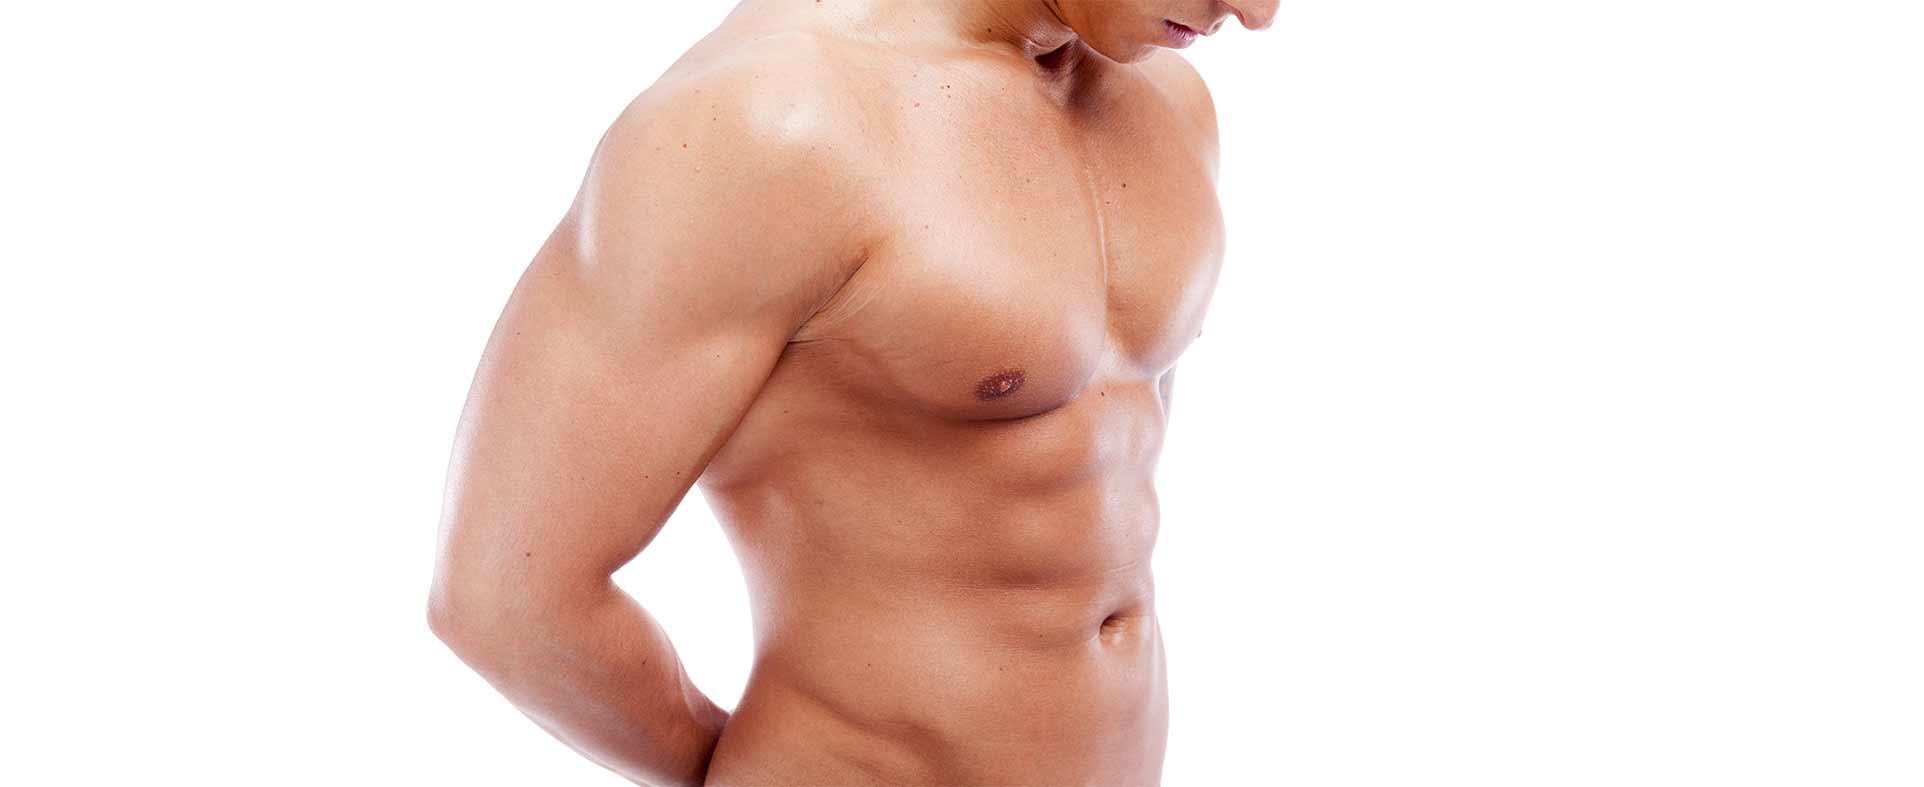 Gynecomastia | Male Breast Correction Surgical Treatment | Male Chest Correction